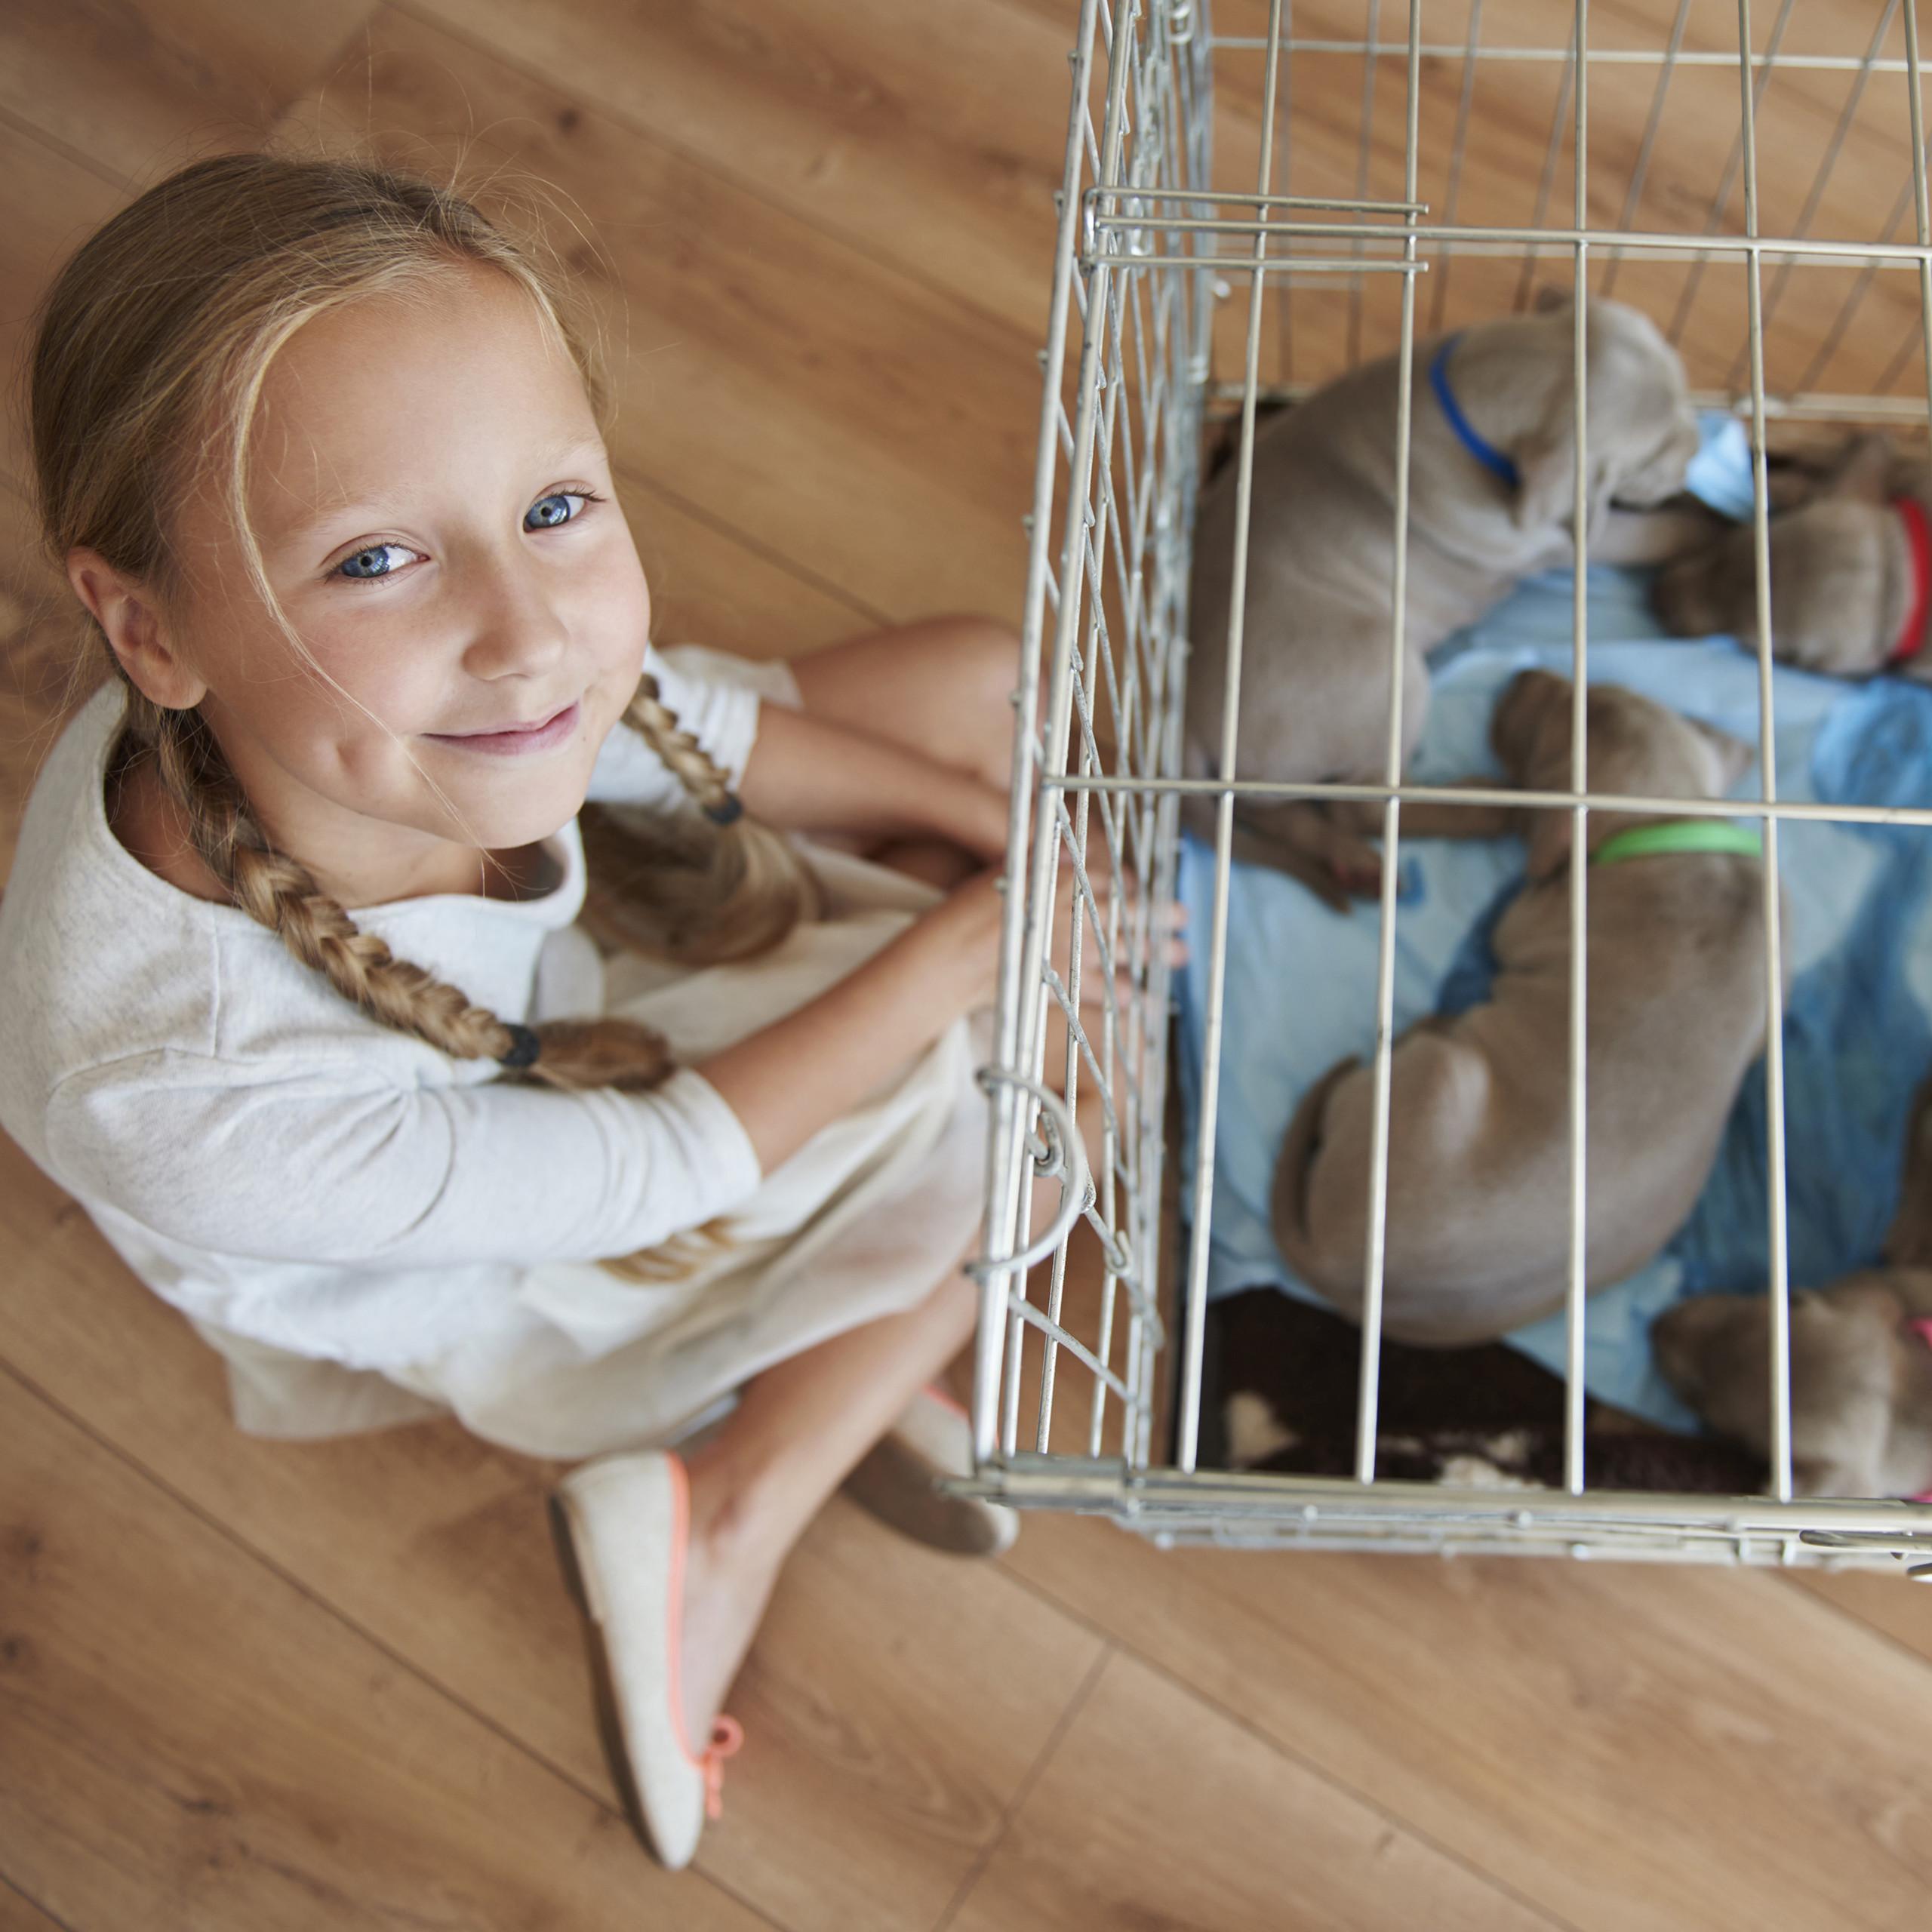 Hondenbench-dubbel-transportbench-transportbox-draadkooi-hond-L-XL-opvouwbaar miniatuur 6